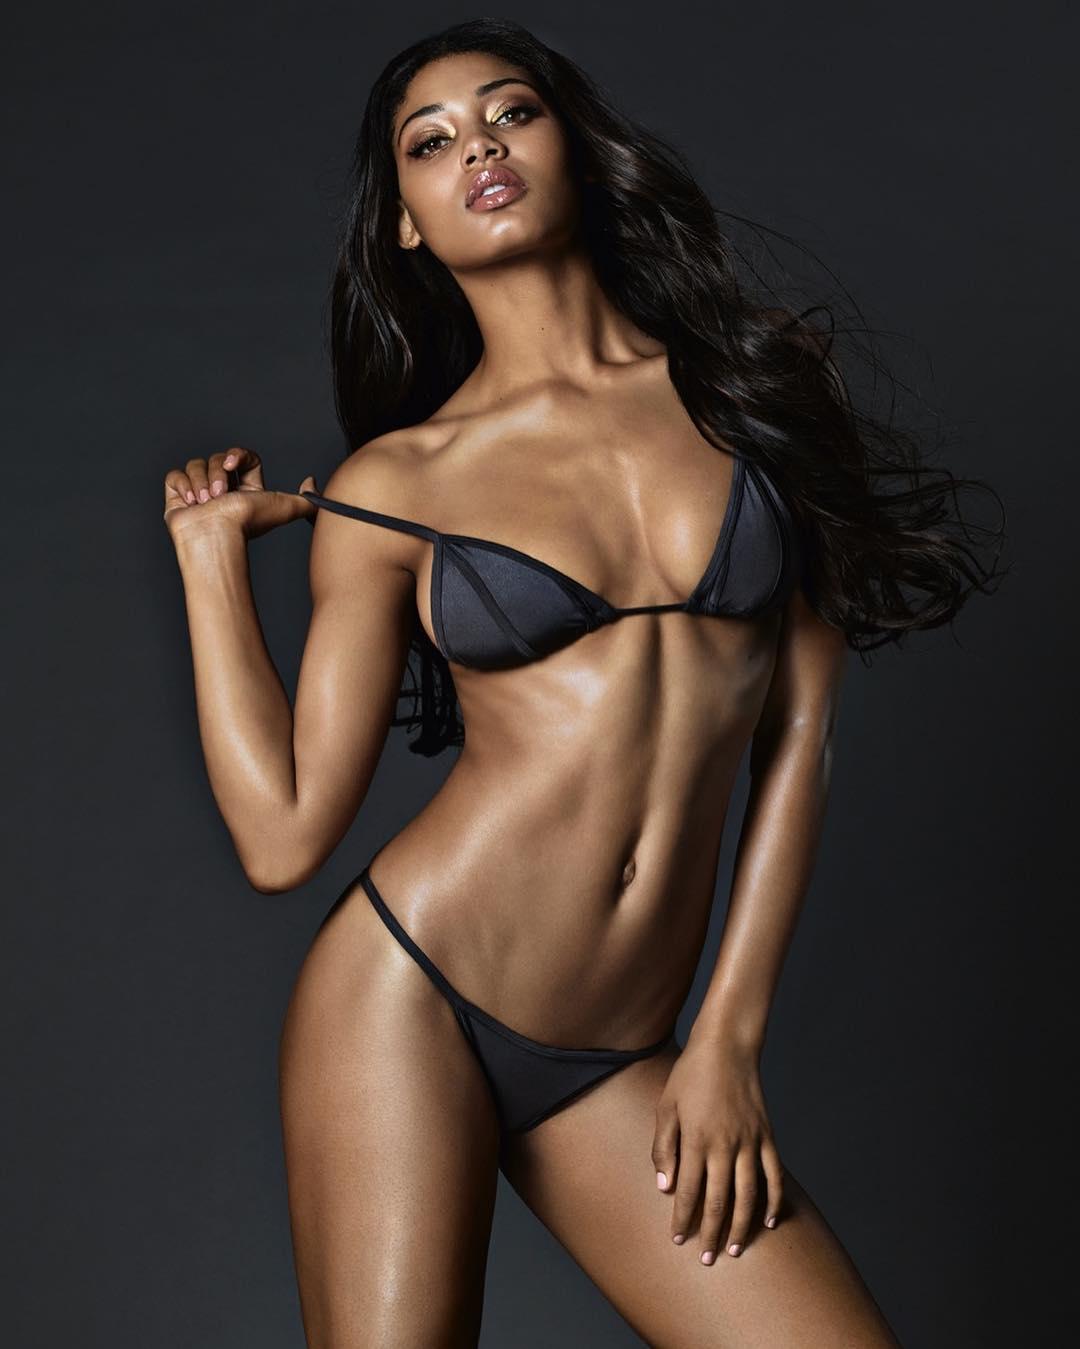 Hot Danielle Herrington nude (75 photo), Sexy, Bikini, Twitter, cameltoe 2015